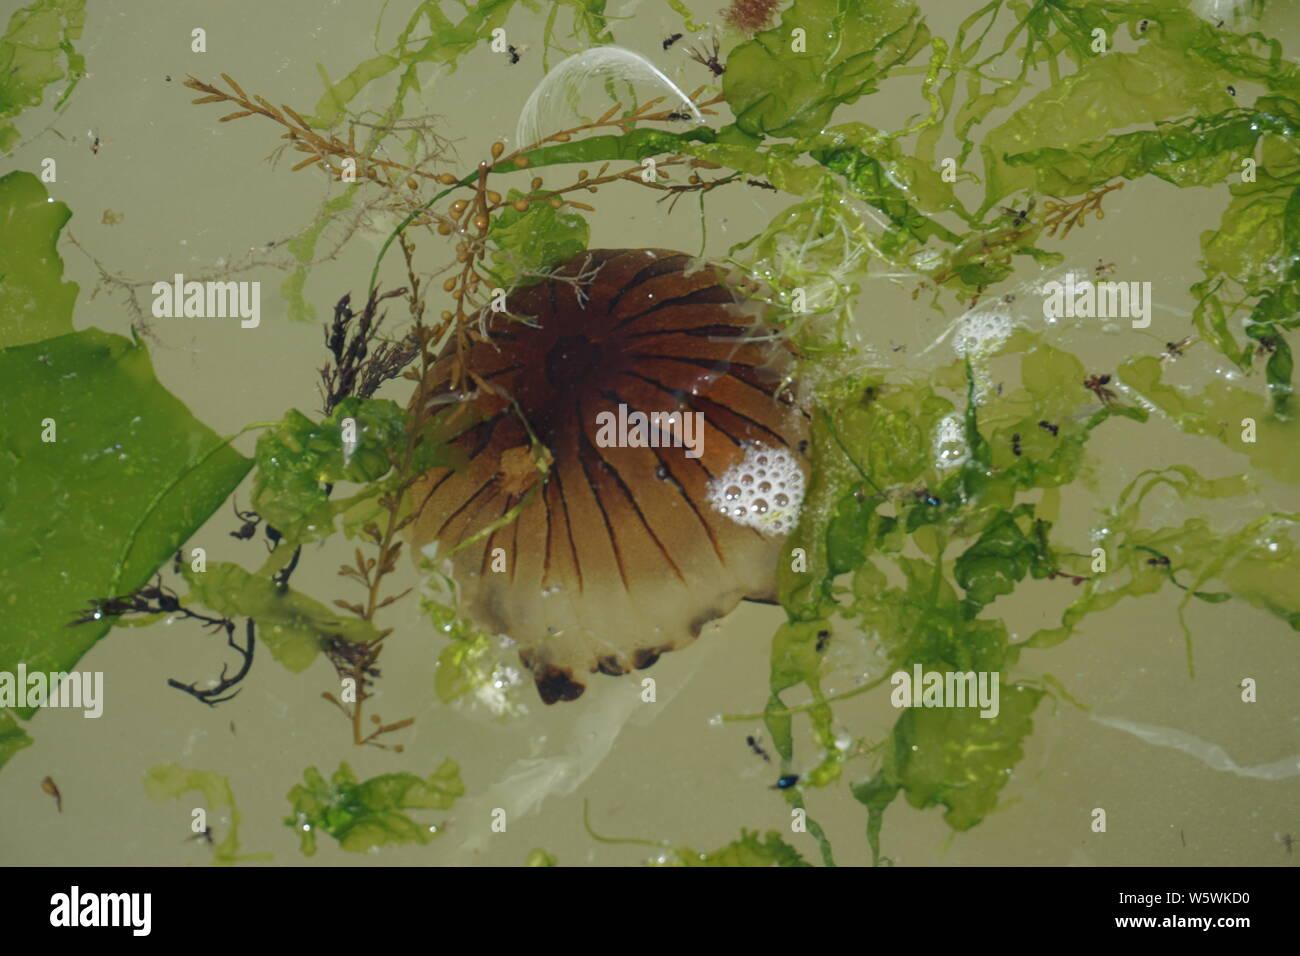 Jelly fish nager avec les algues d'un vert vif dans la mer Banque D'Images